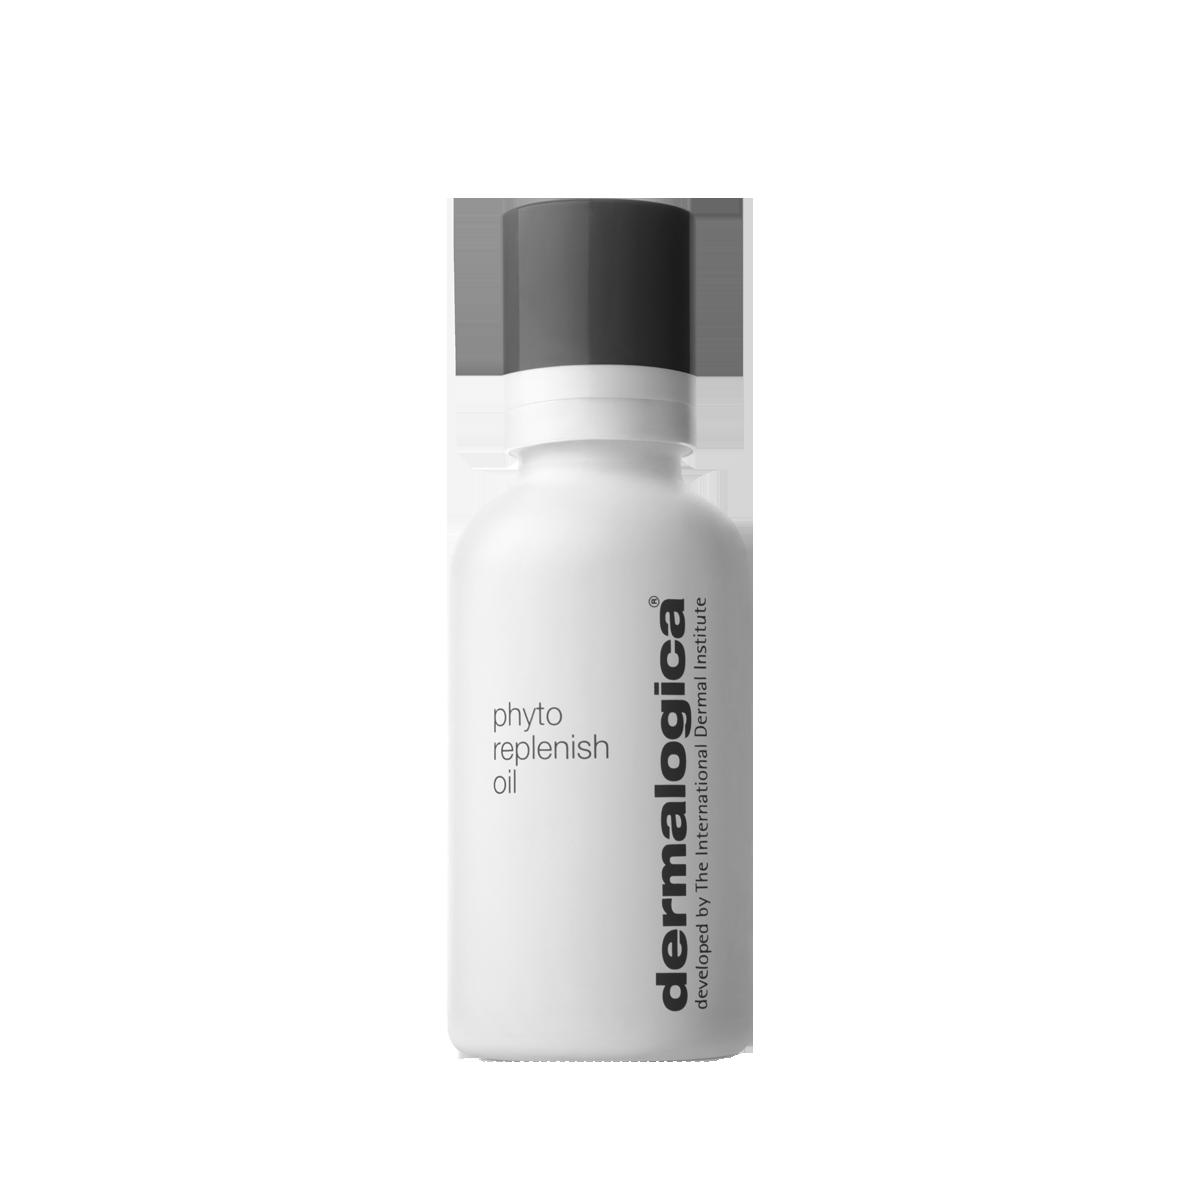 Phyto Replenish Oil - 30ml-1